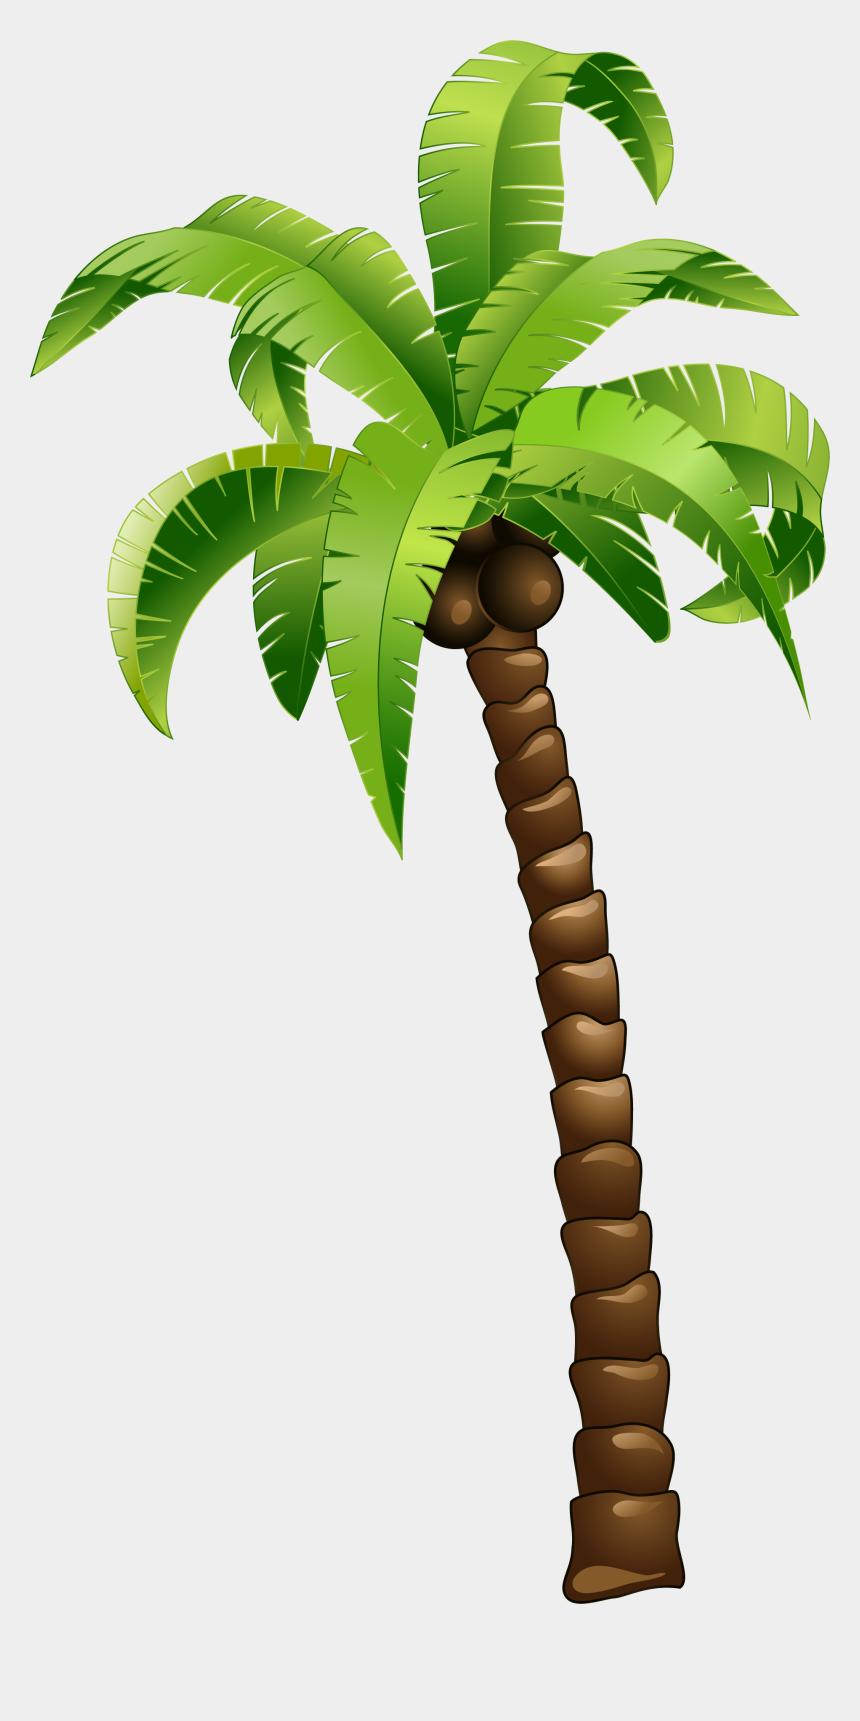 coconut tree clipart, Cartoons - Cartoon Green Coconut Tree - Beach Background Summer Design